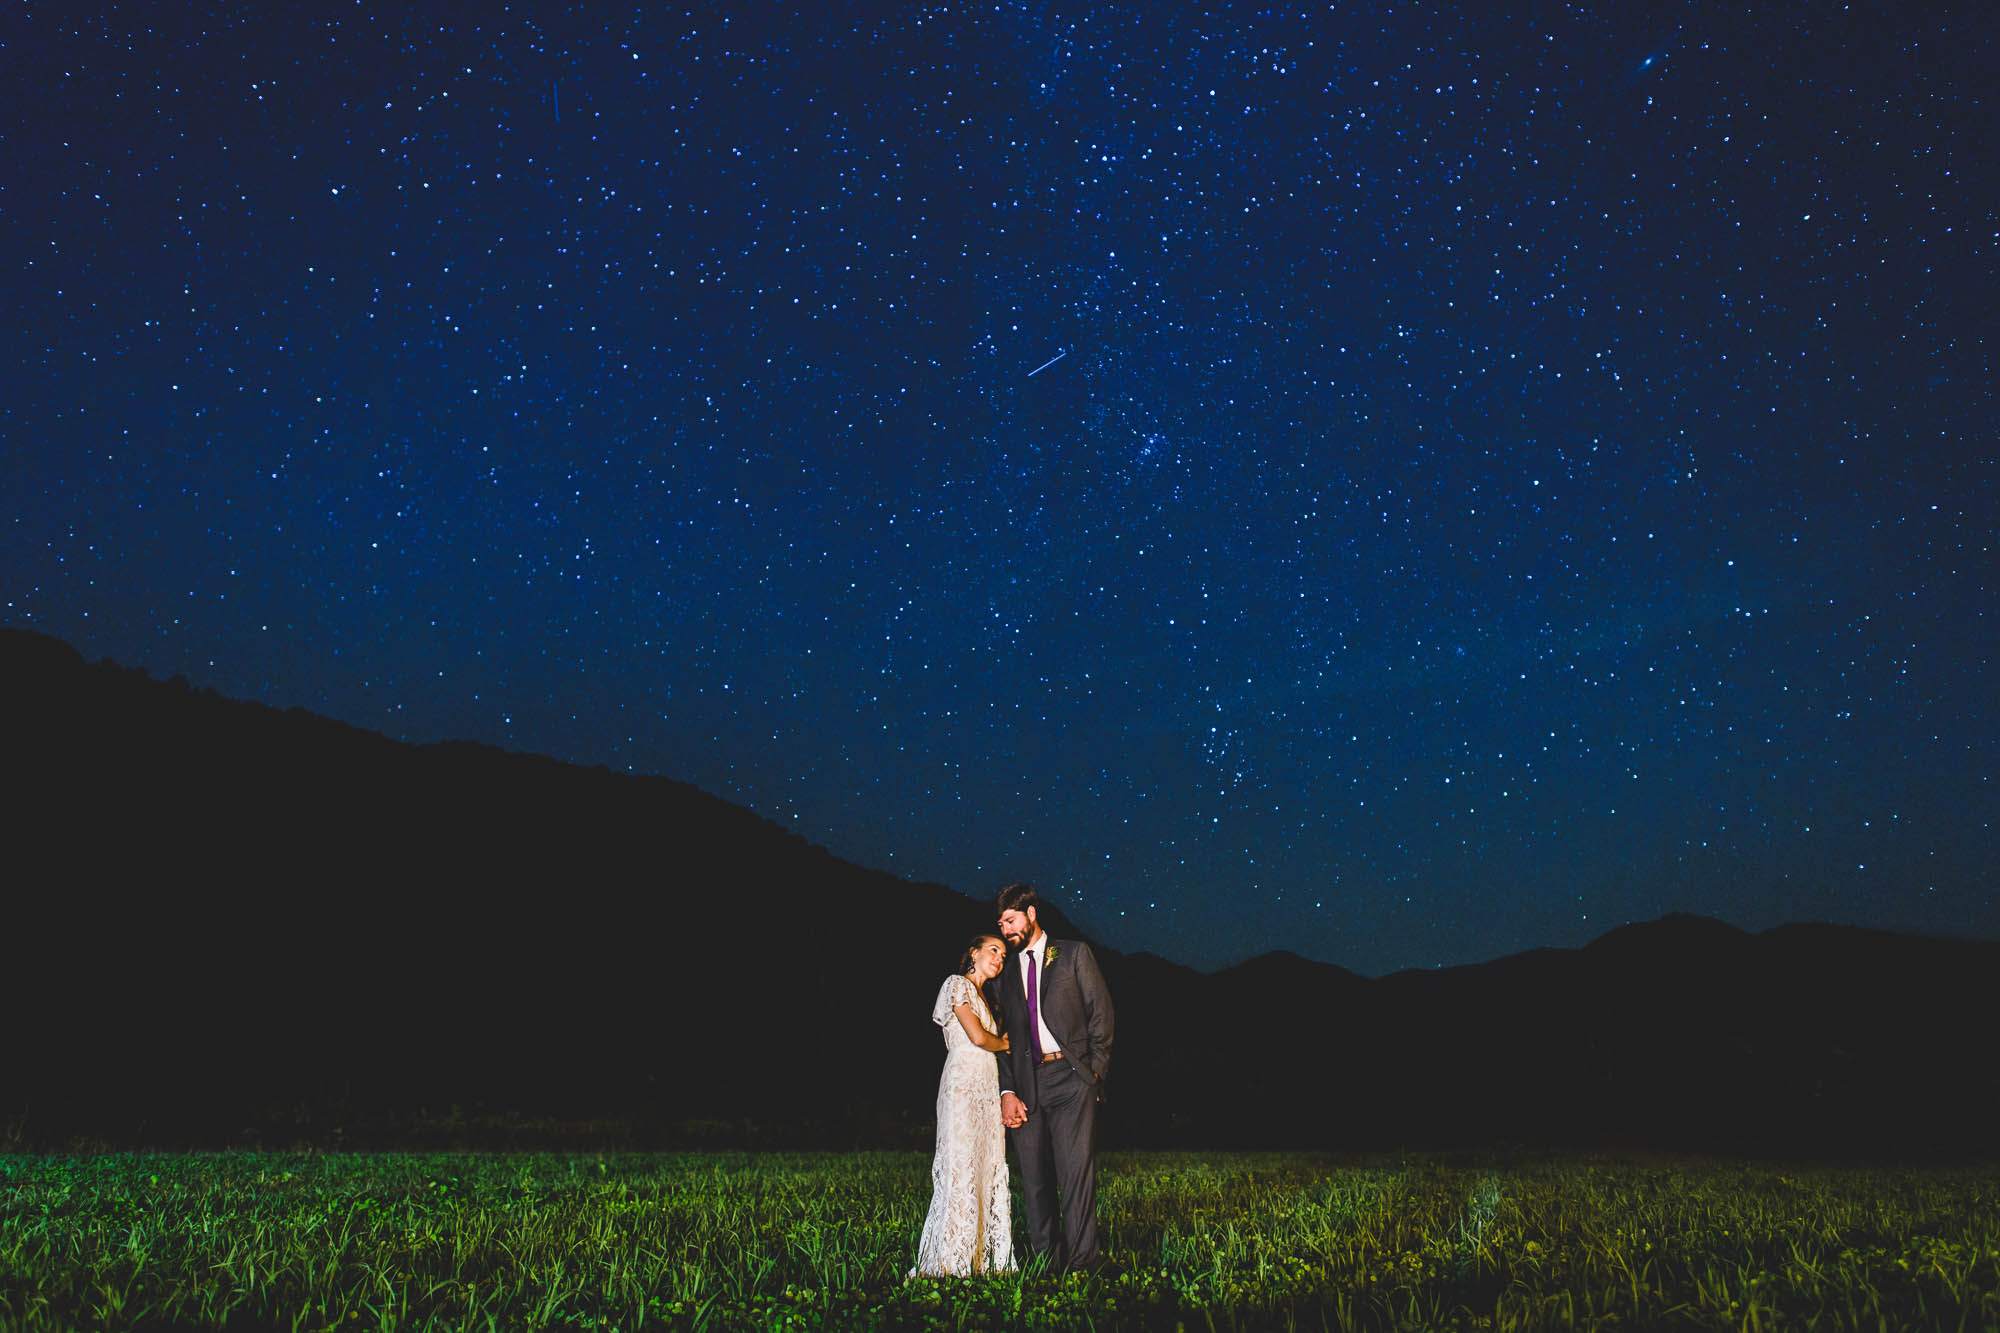 Wedding stars photo